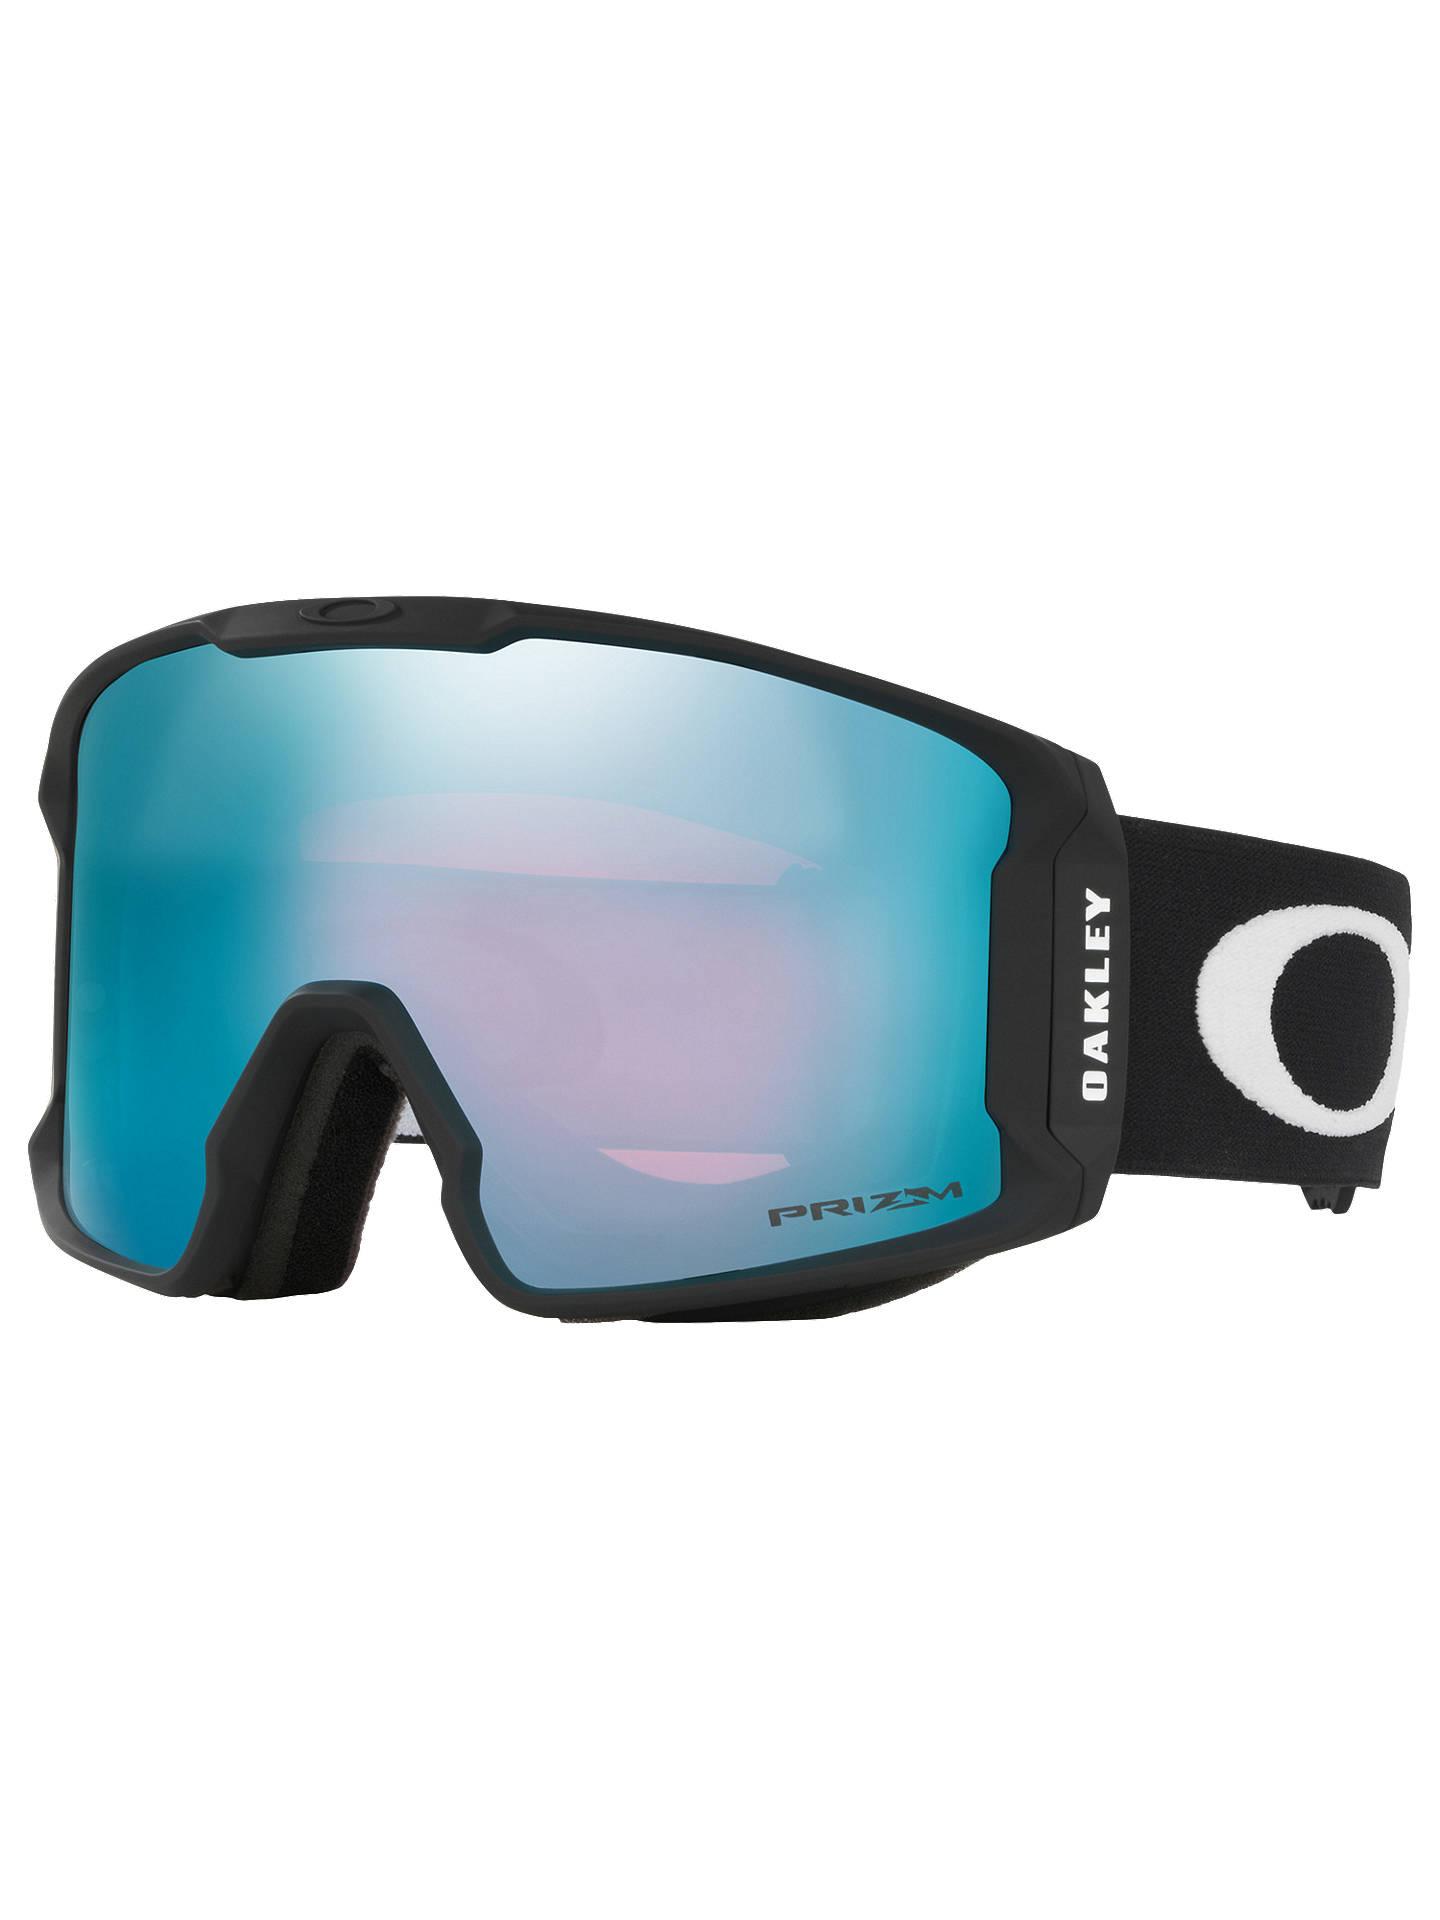 a847884b2b7 Buy Oakley OO7070 Men s Line Miner Ski Goggles